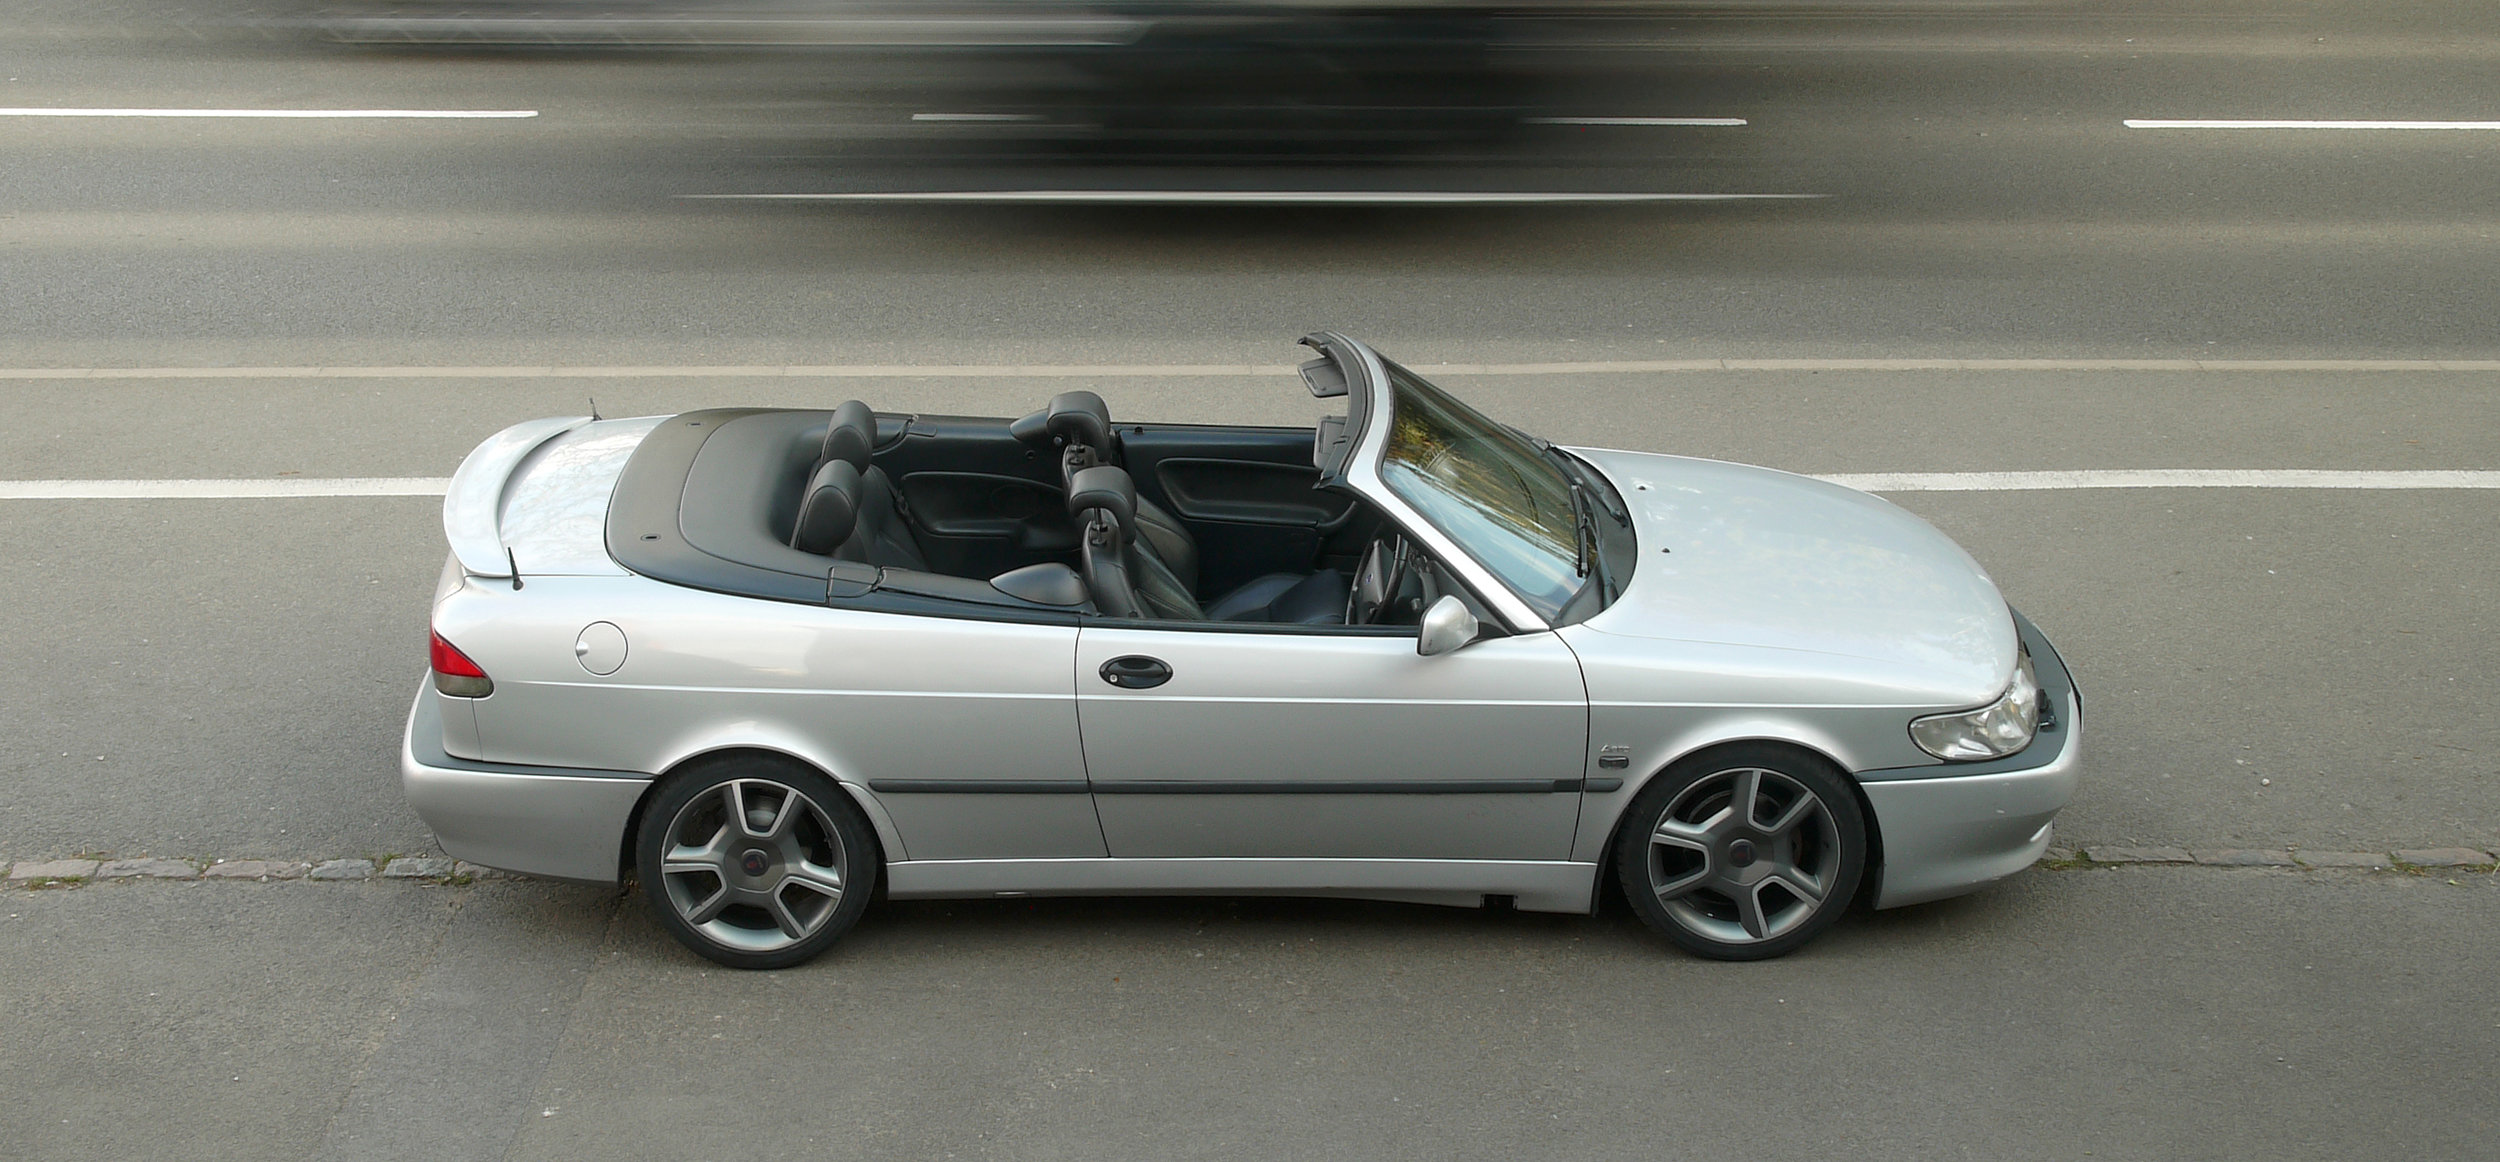 Fast Car 2.jpg